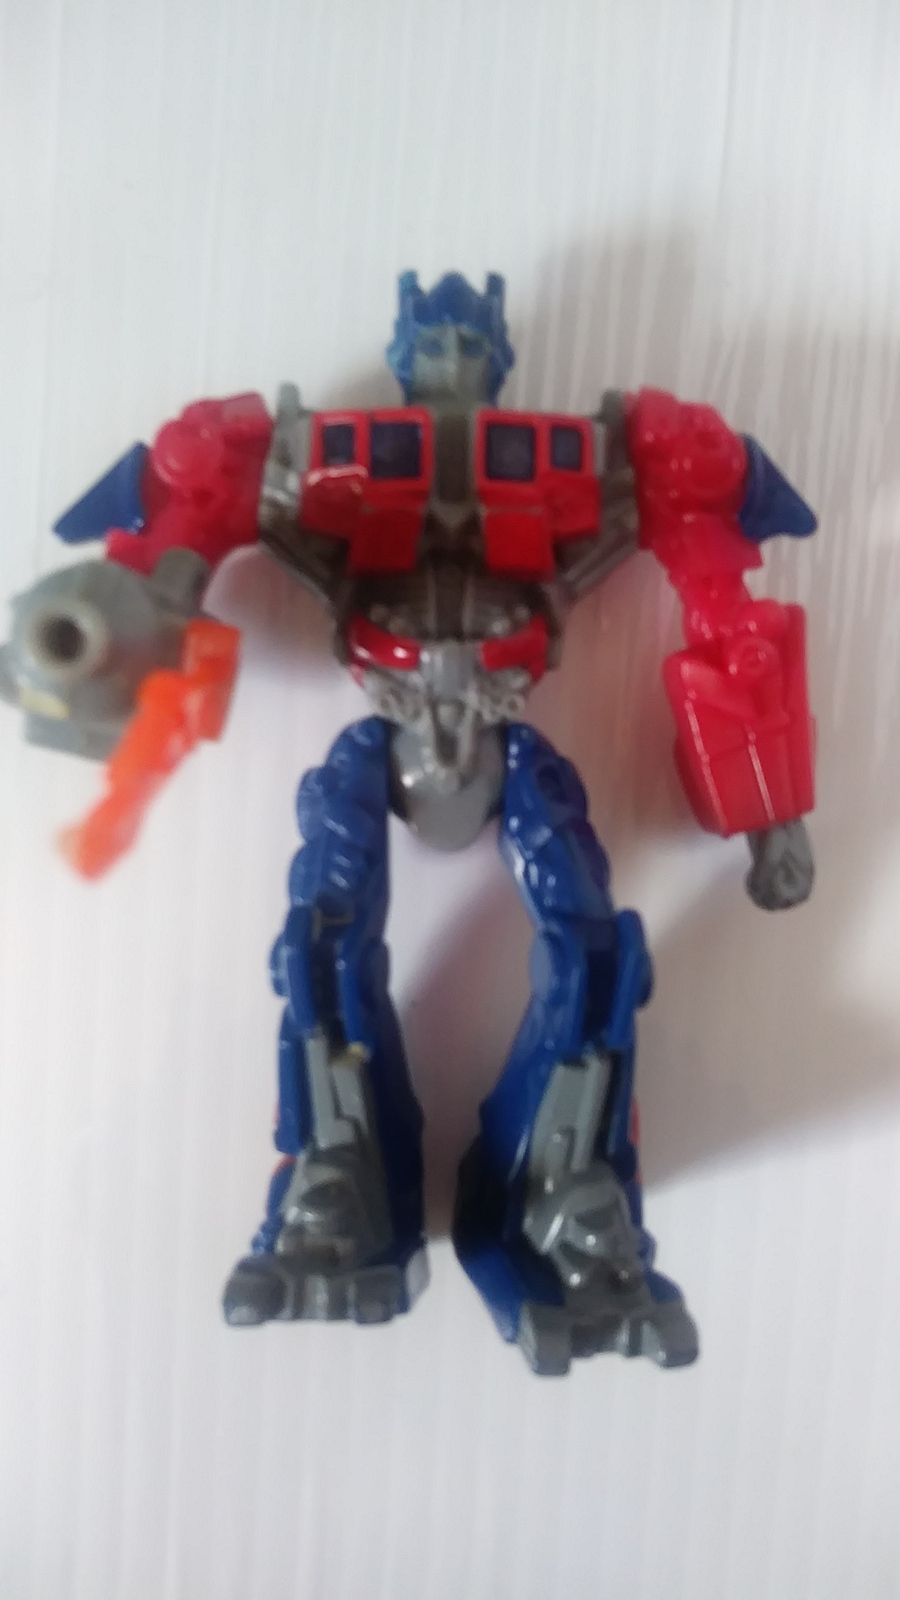 Toys R Us Original Transformers F//S NEW Optimus Prime Rusty ver